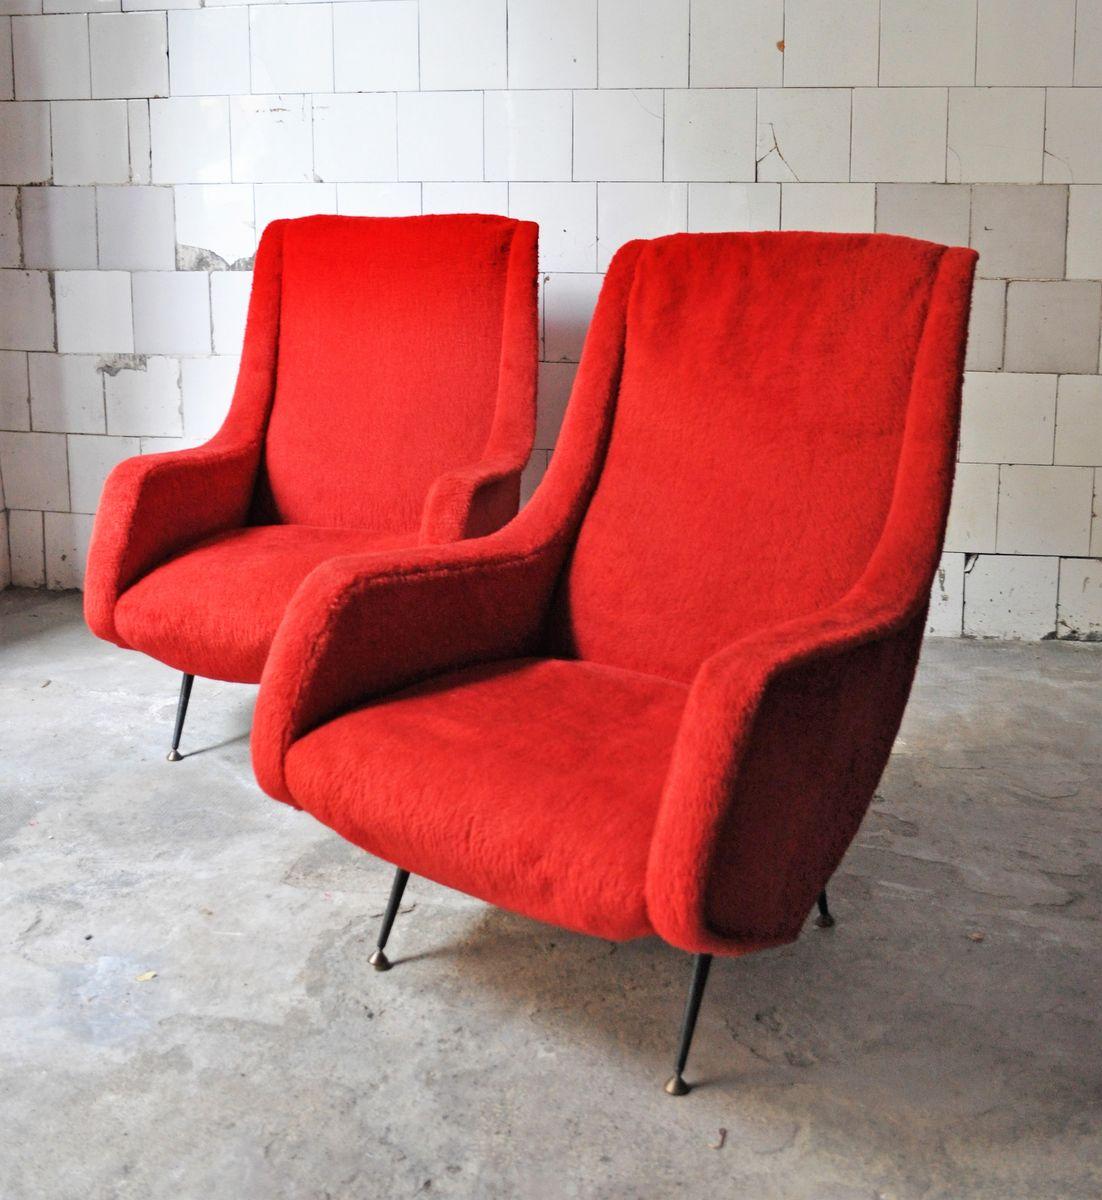 mid century sessel mit holzgestellen 2er set bei pamono kaufen. Black Bedroom Furniture Sets. Home Design Ideas